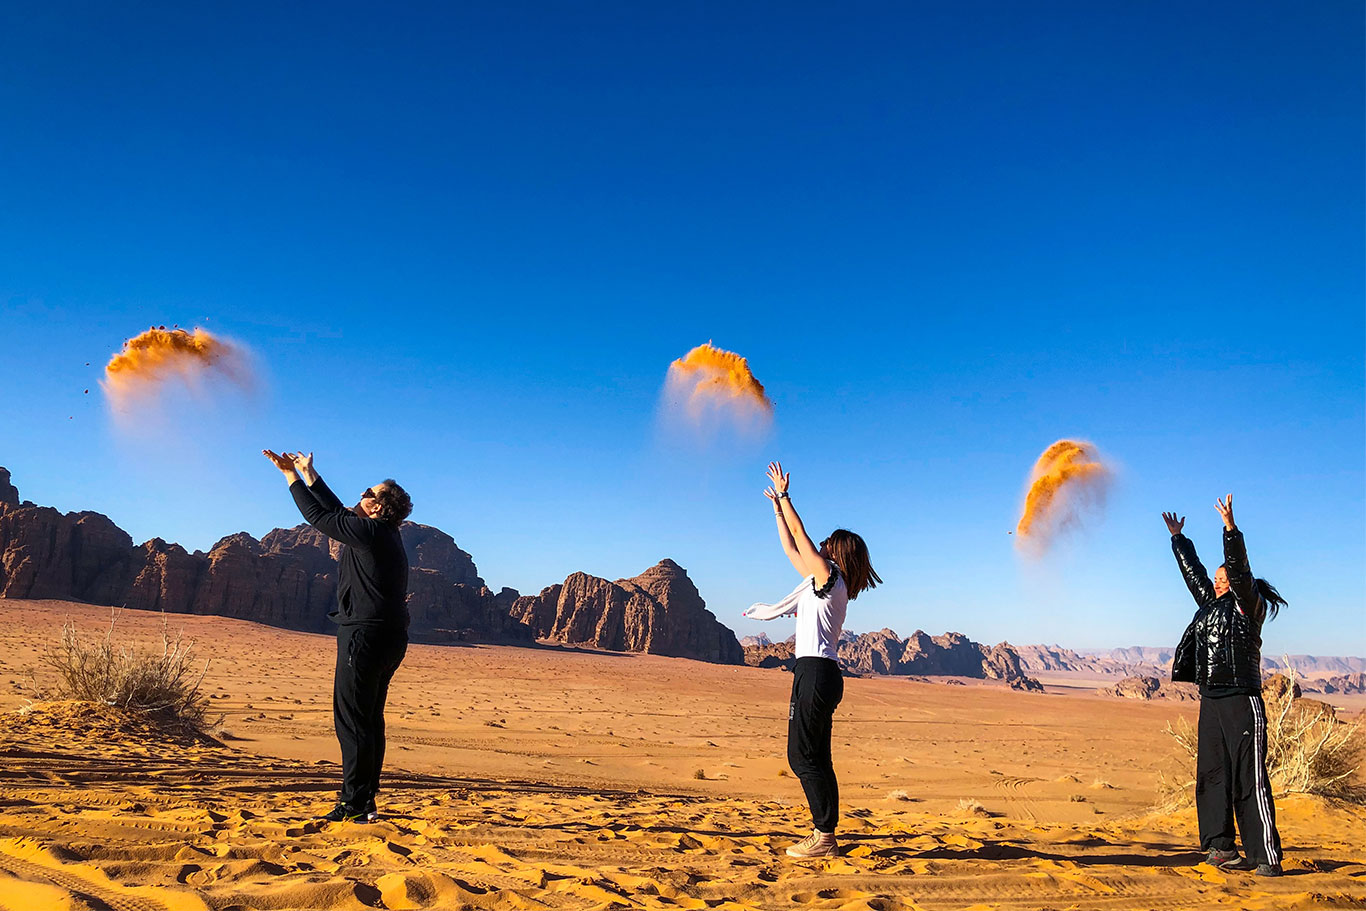 Viaggio in Giordania © Nicolò Barbieri